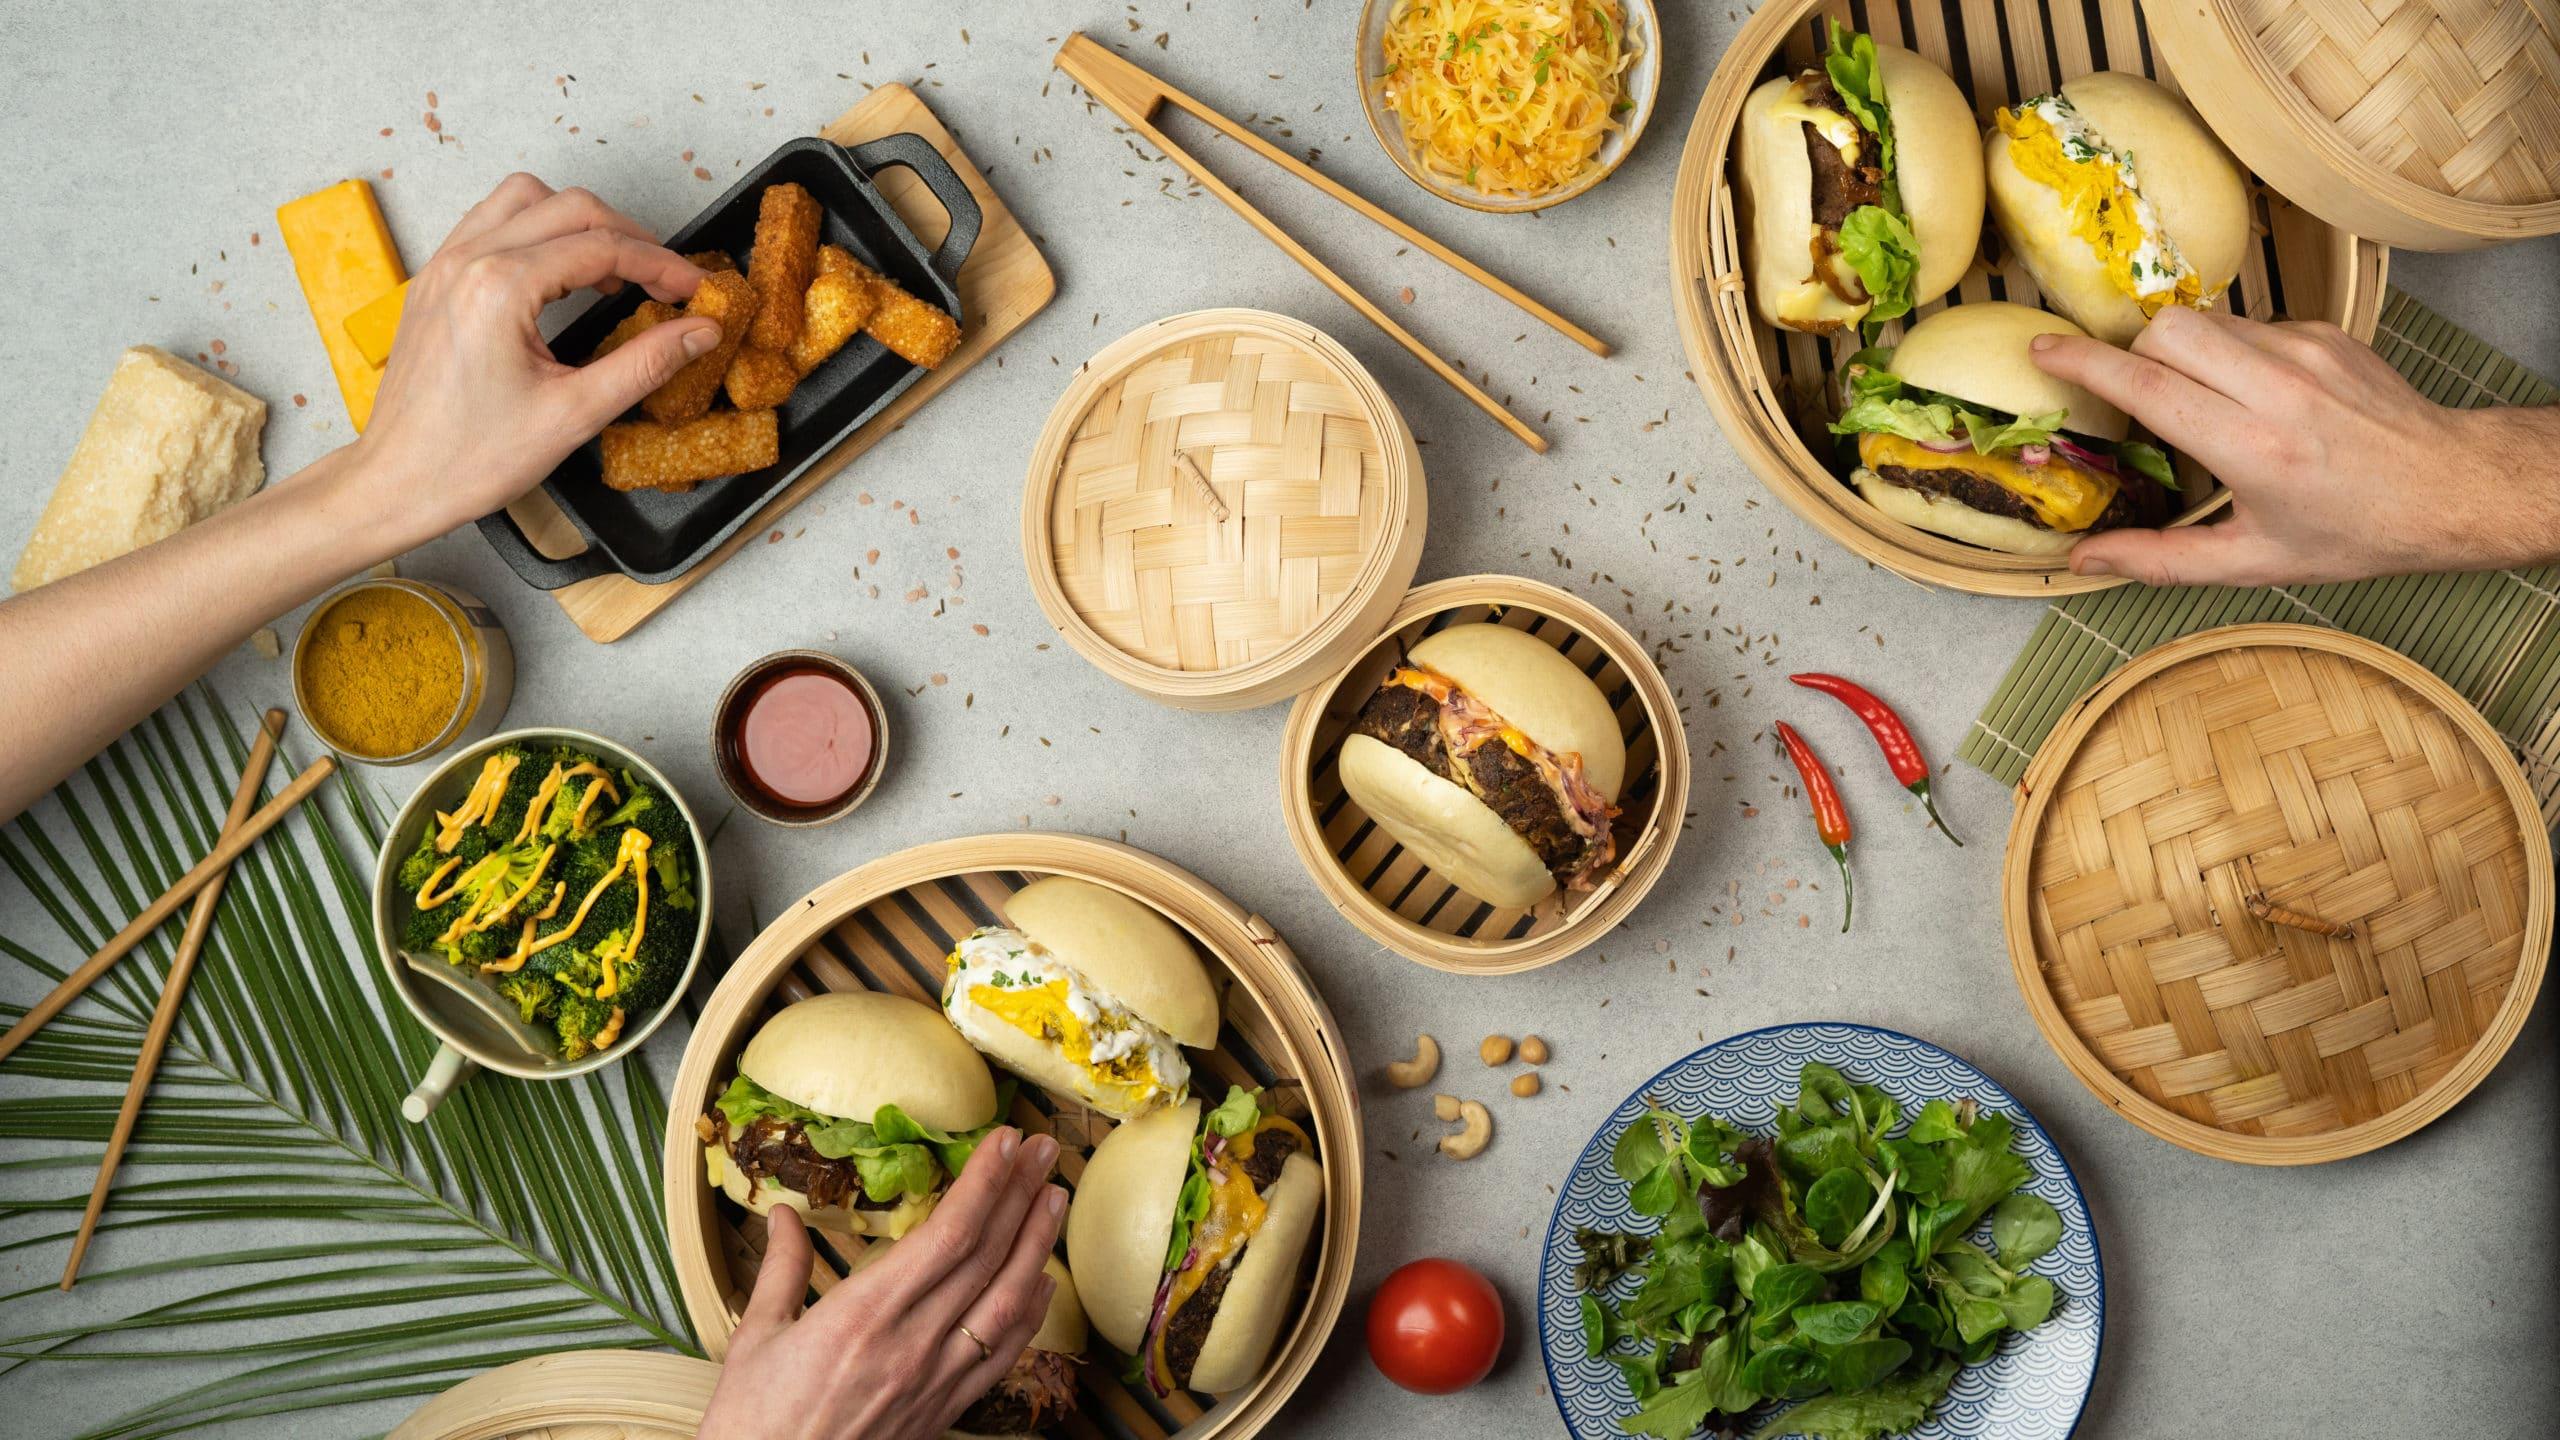 MamaBao-Restaurant Bao burger lyon